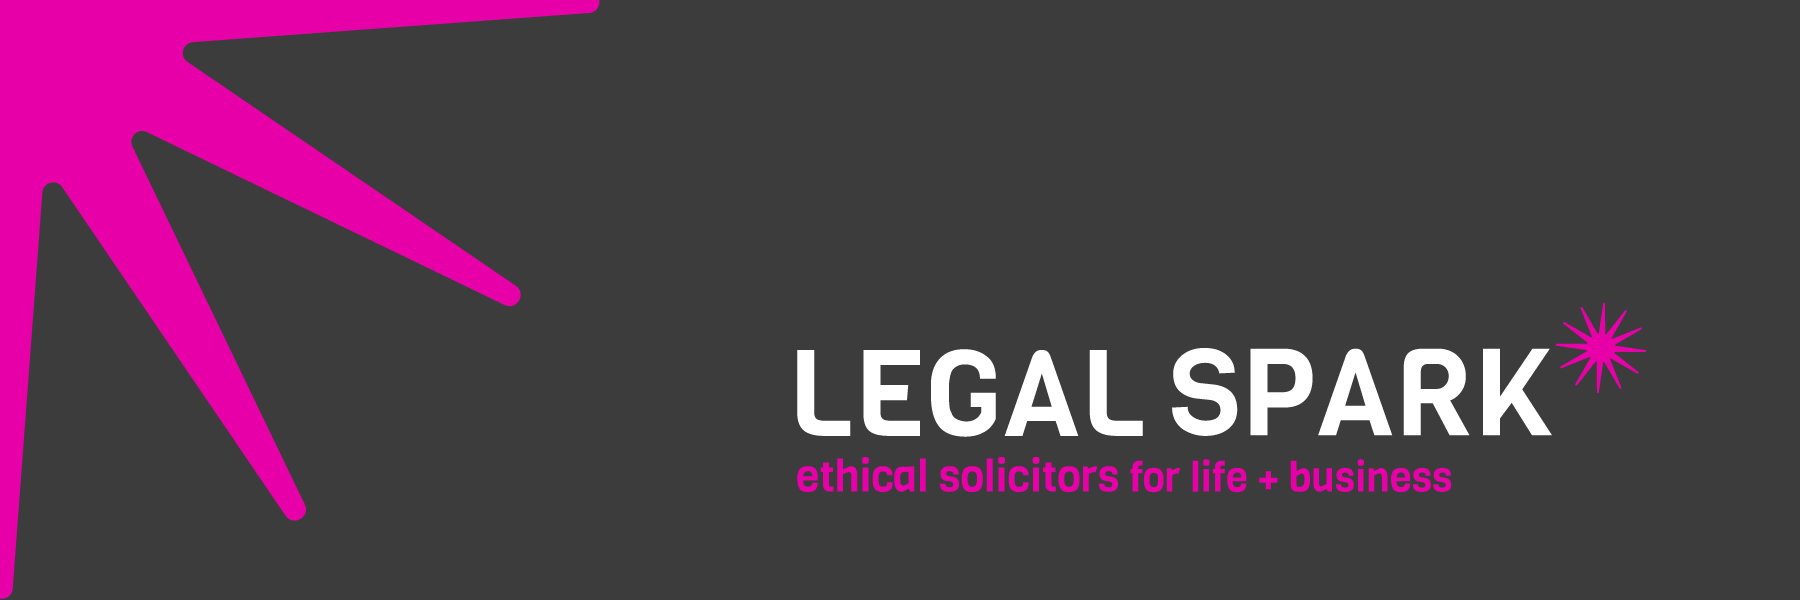 Legal Spark brand